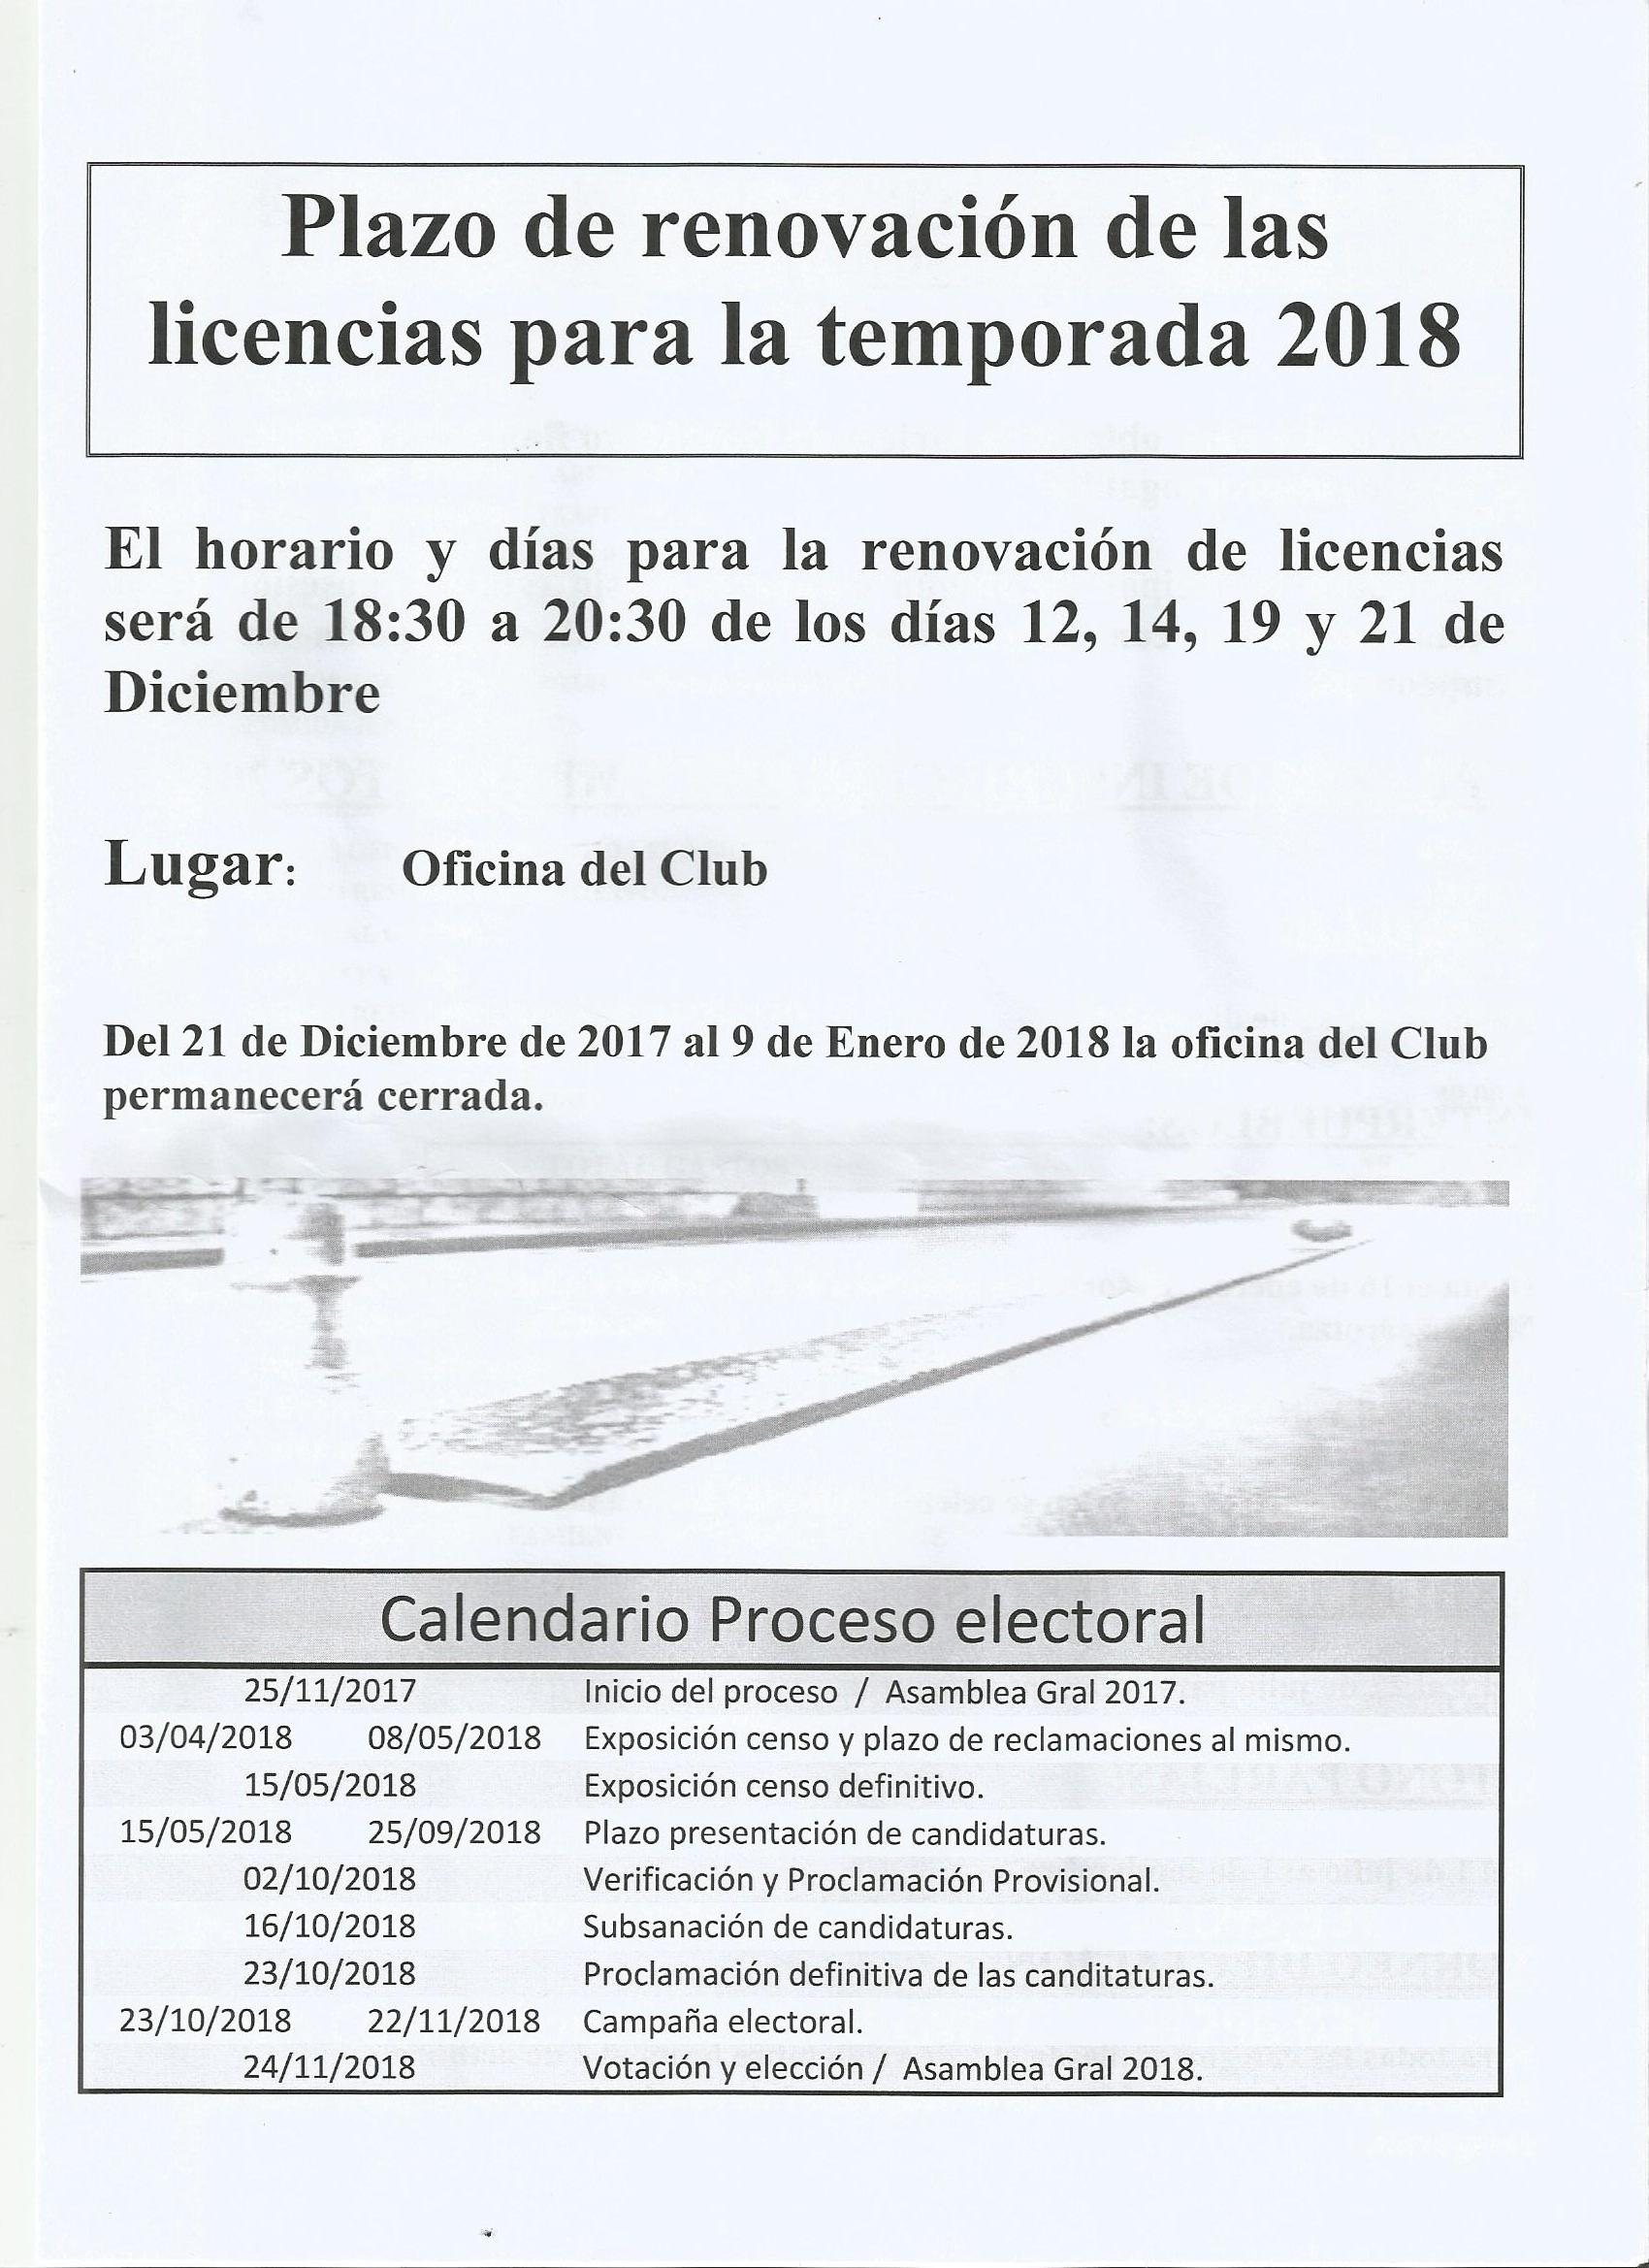 PLAZOS DE RENOVACION 2018